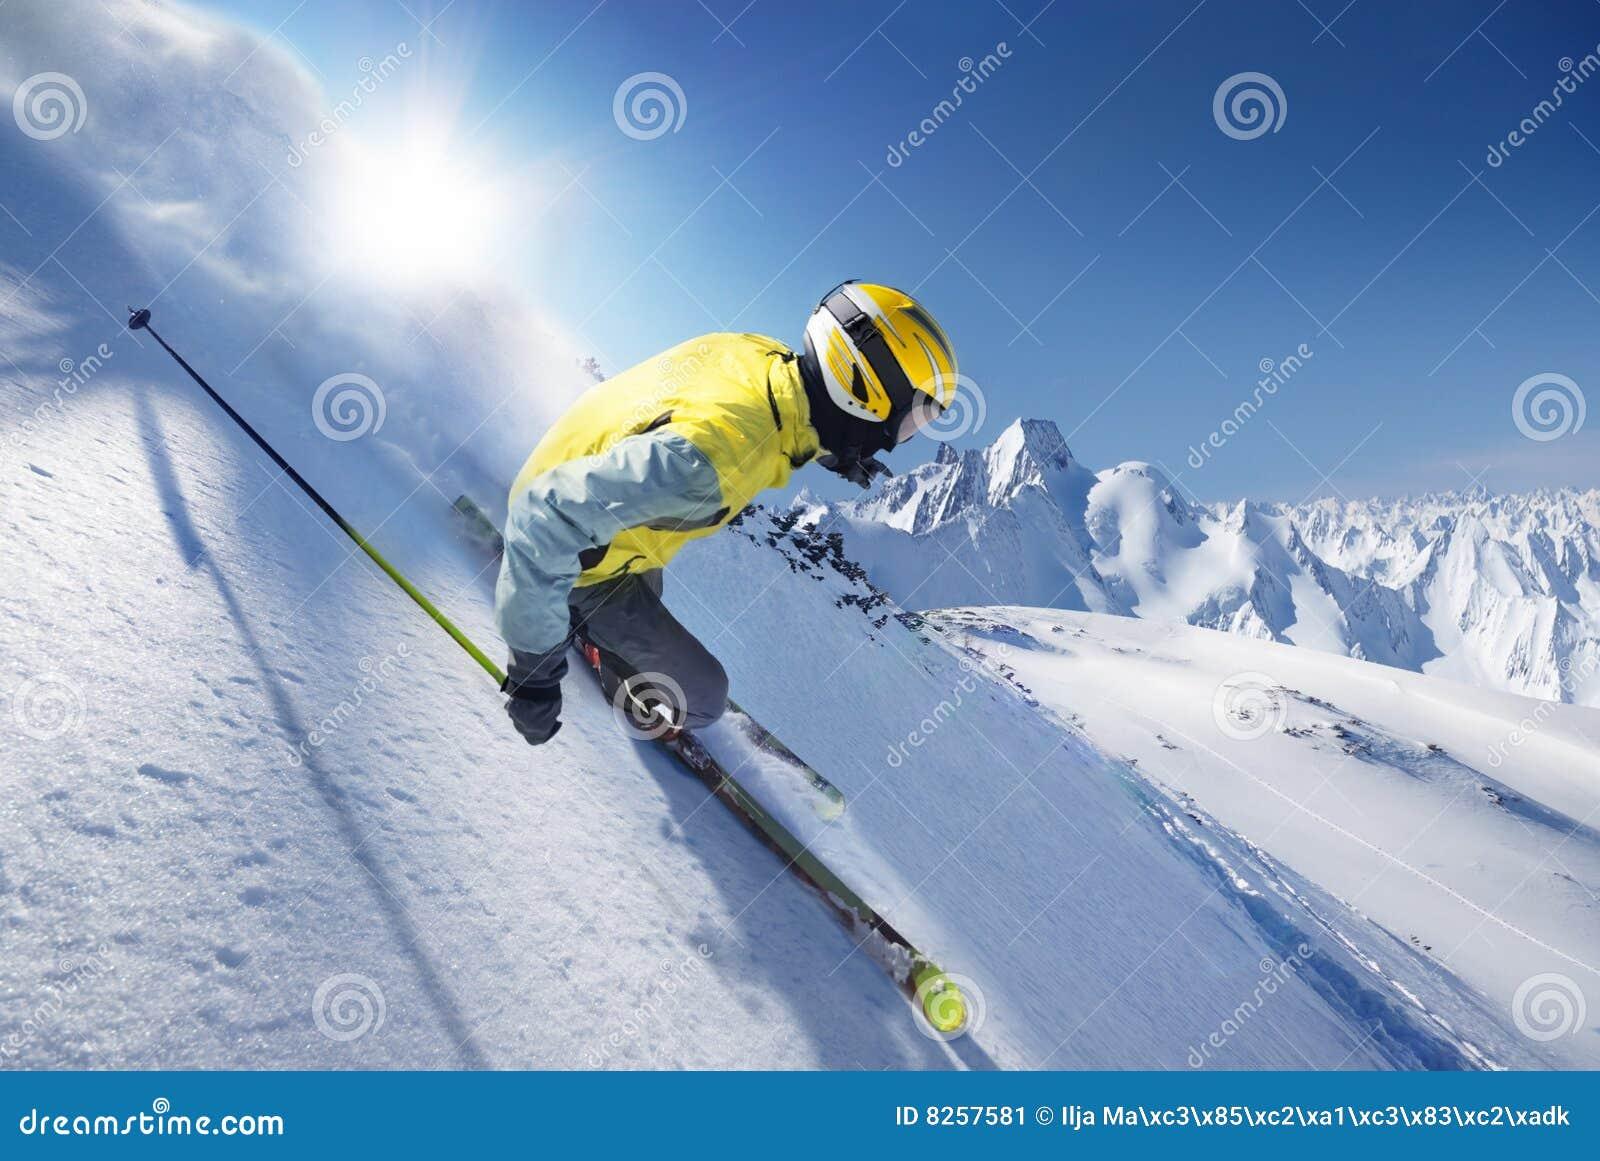 Skiër